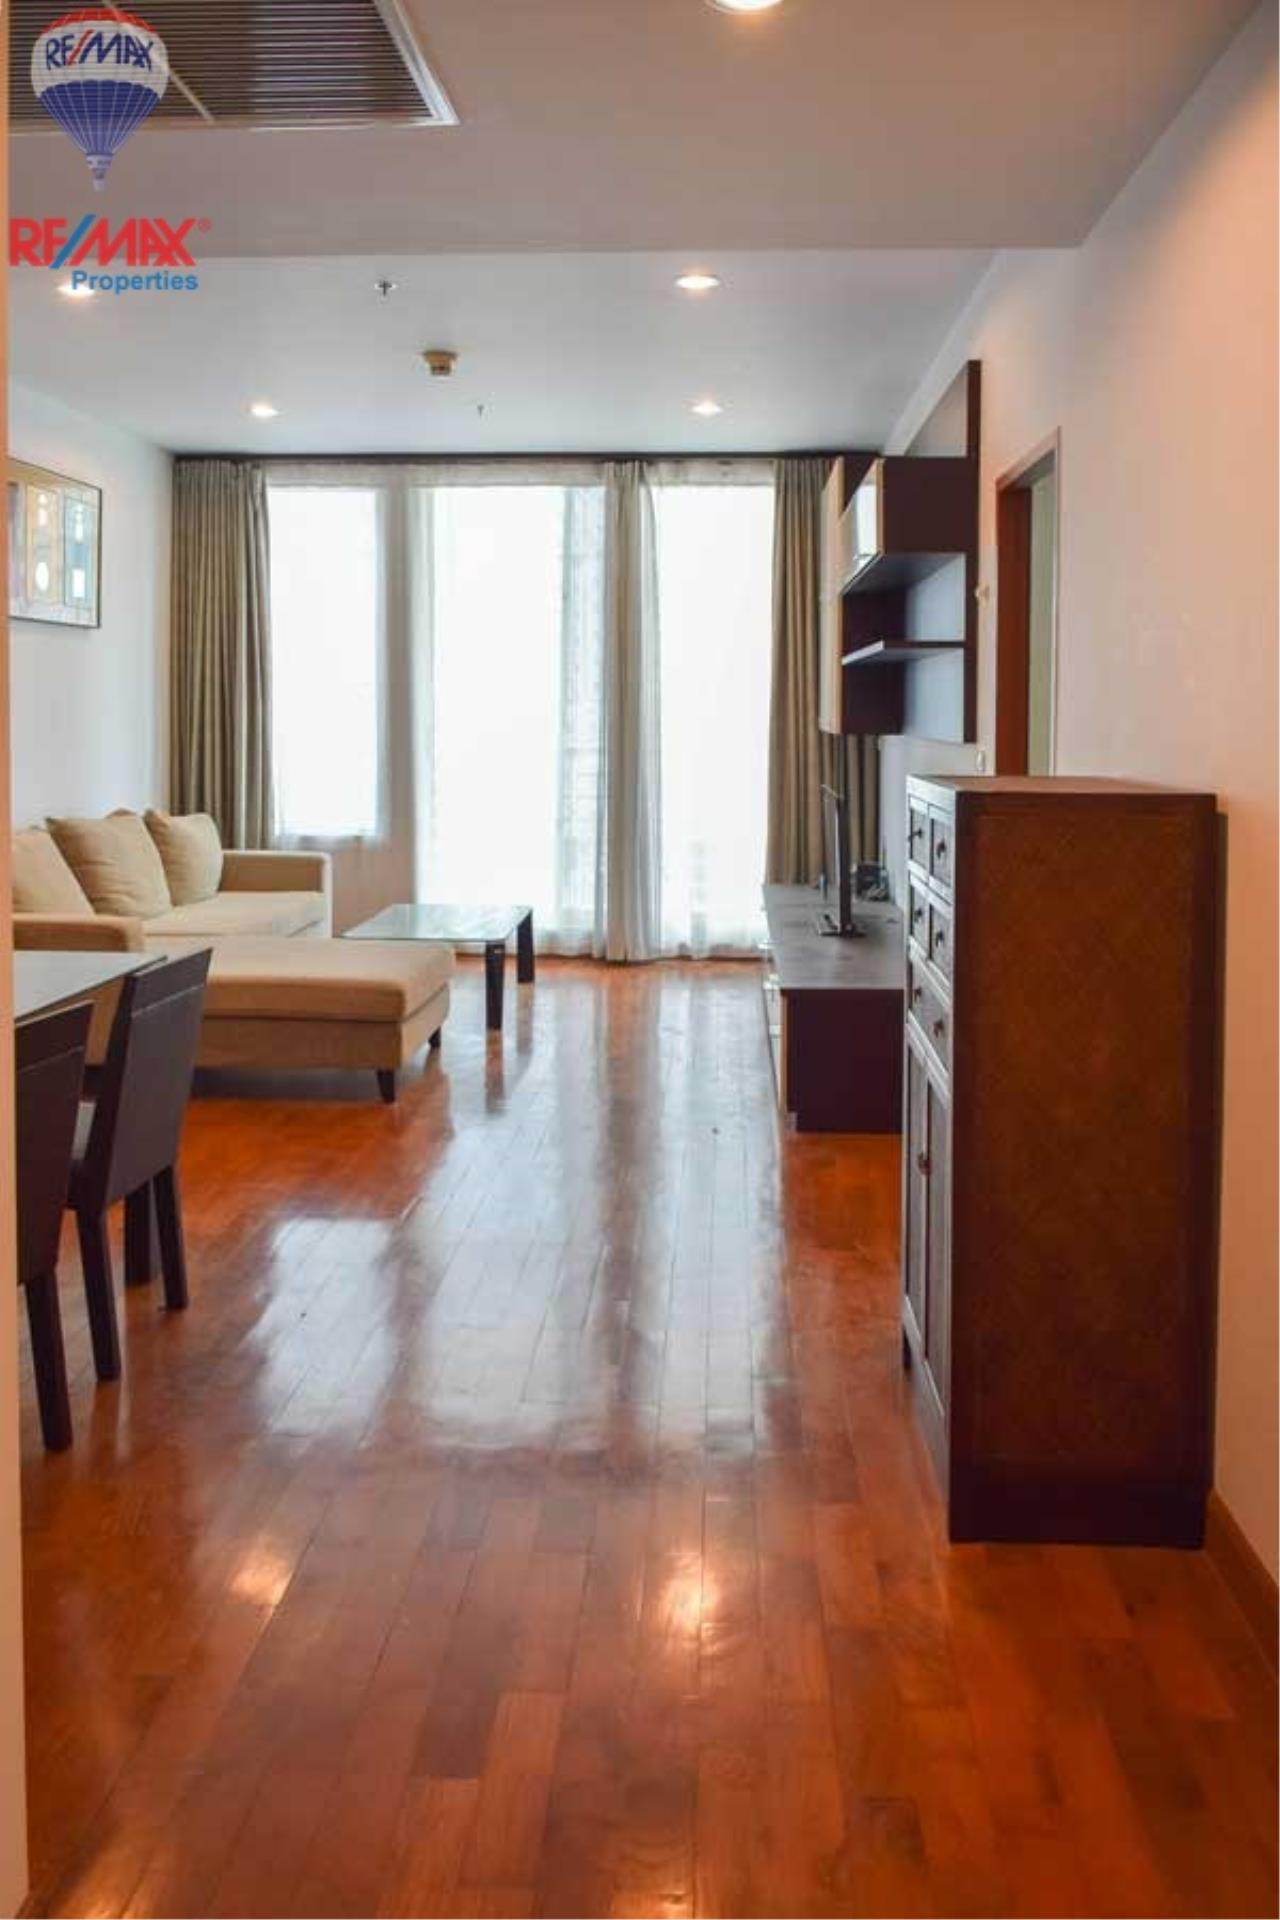 RE/MAX Properties Agency's Condo for Rent Sukhumvit, Bangkok  6